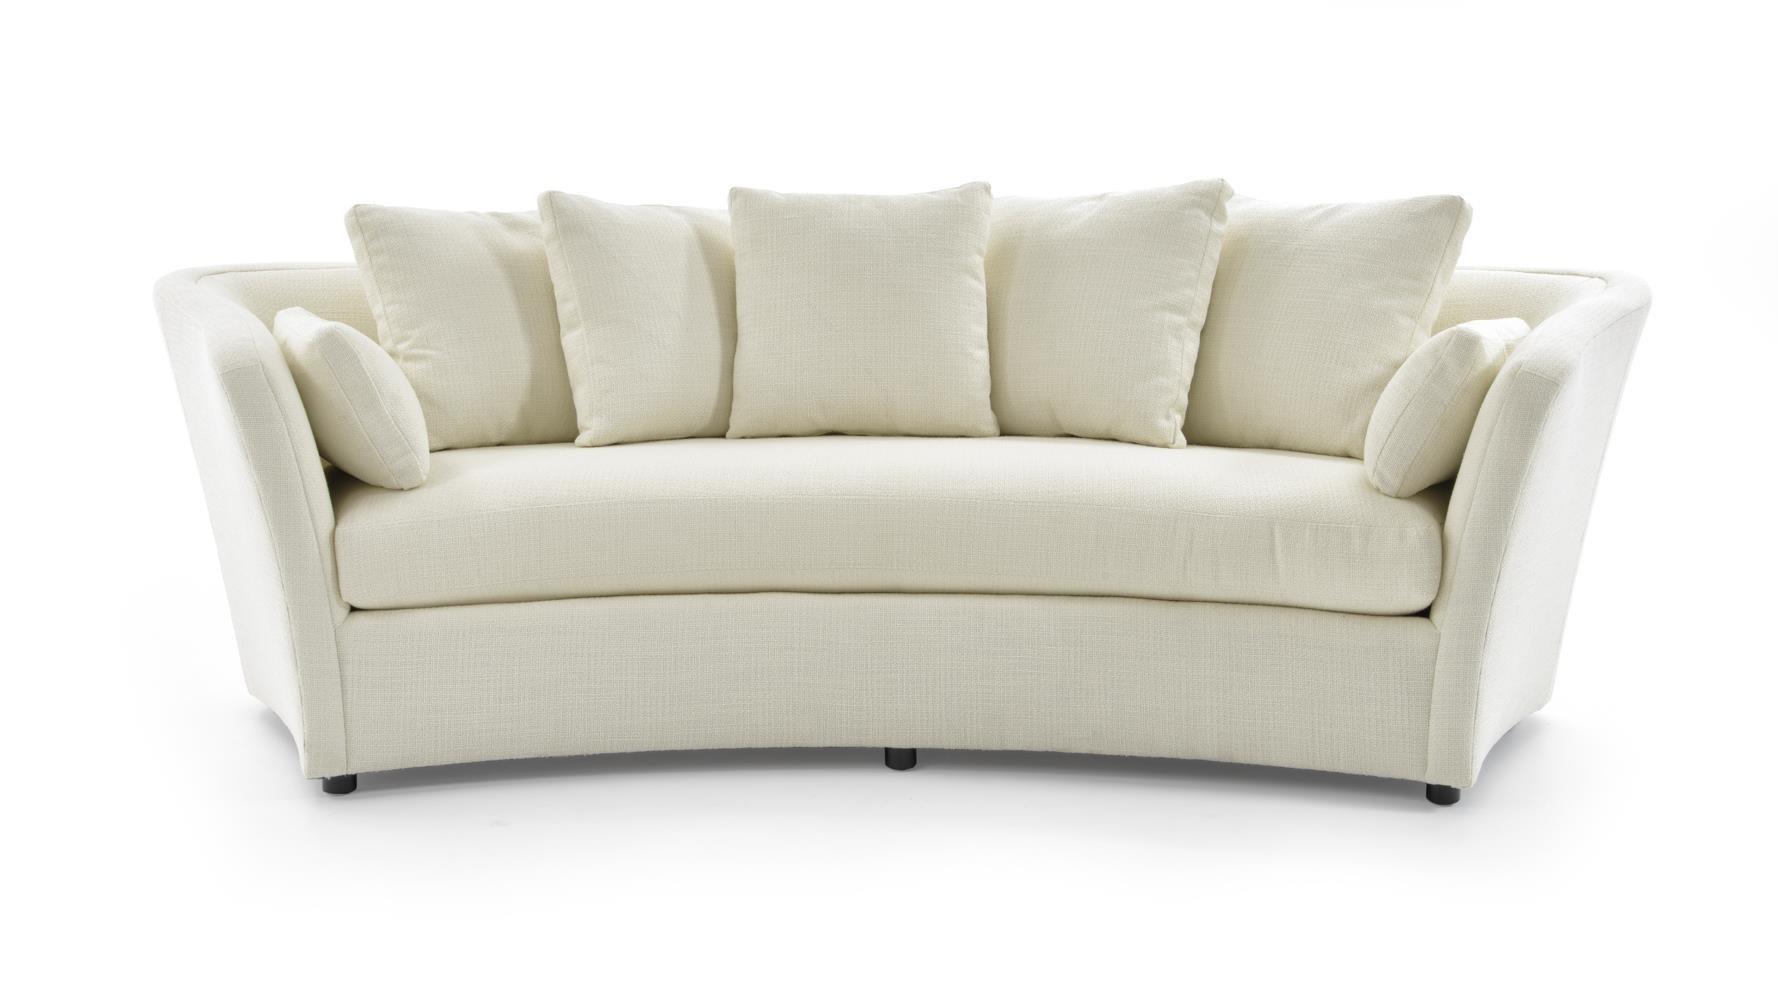 Century Studio Essentials Upholstery Arched Sofa ... ZOKGMXW